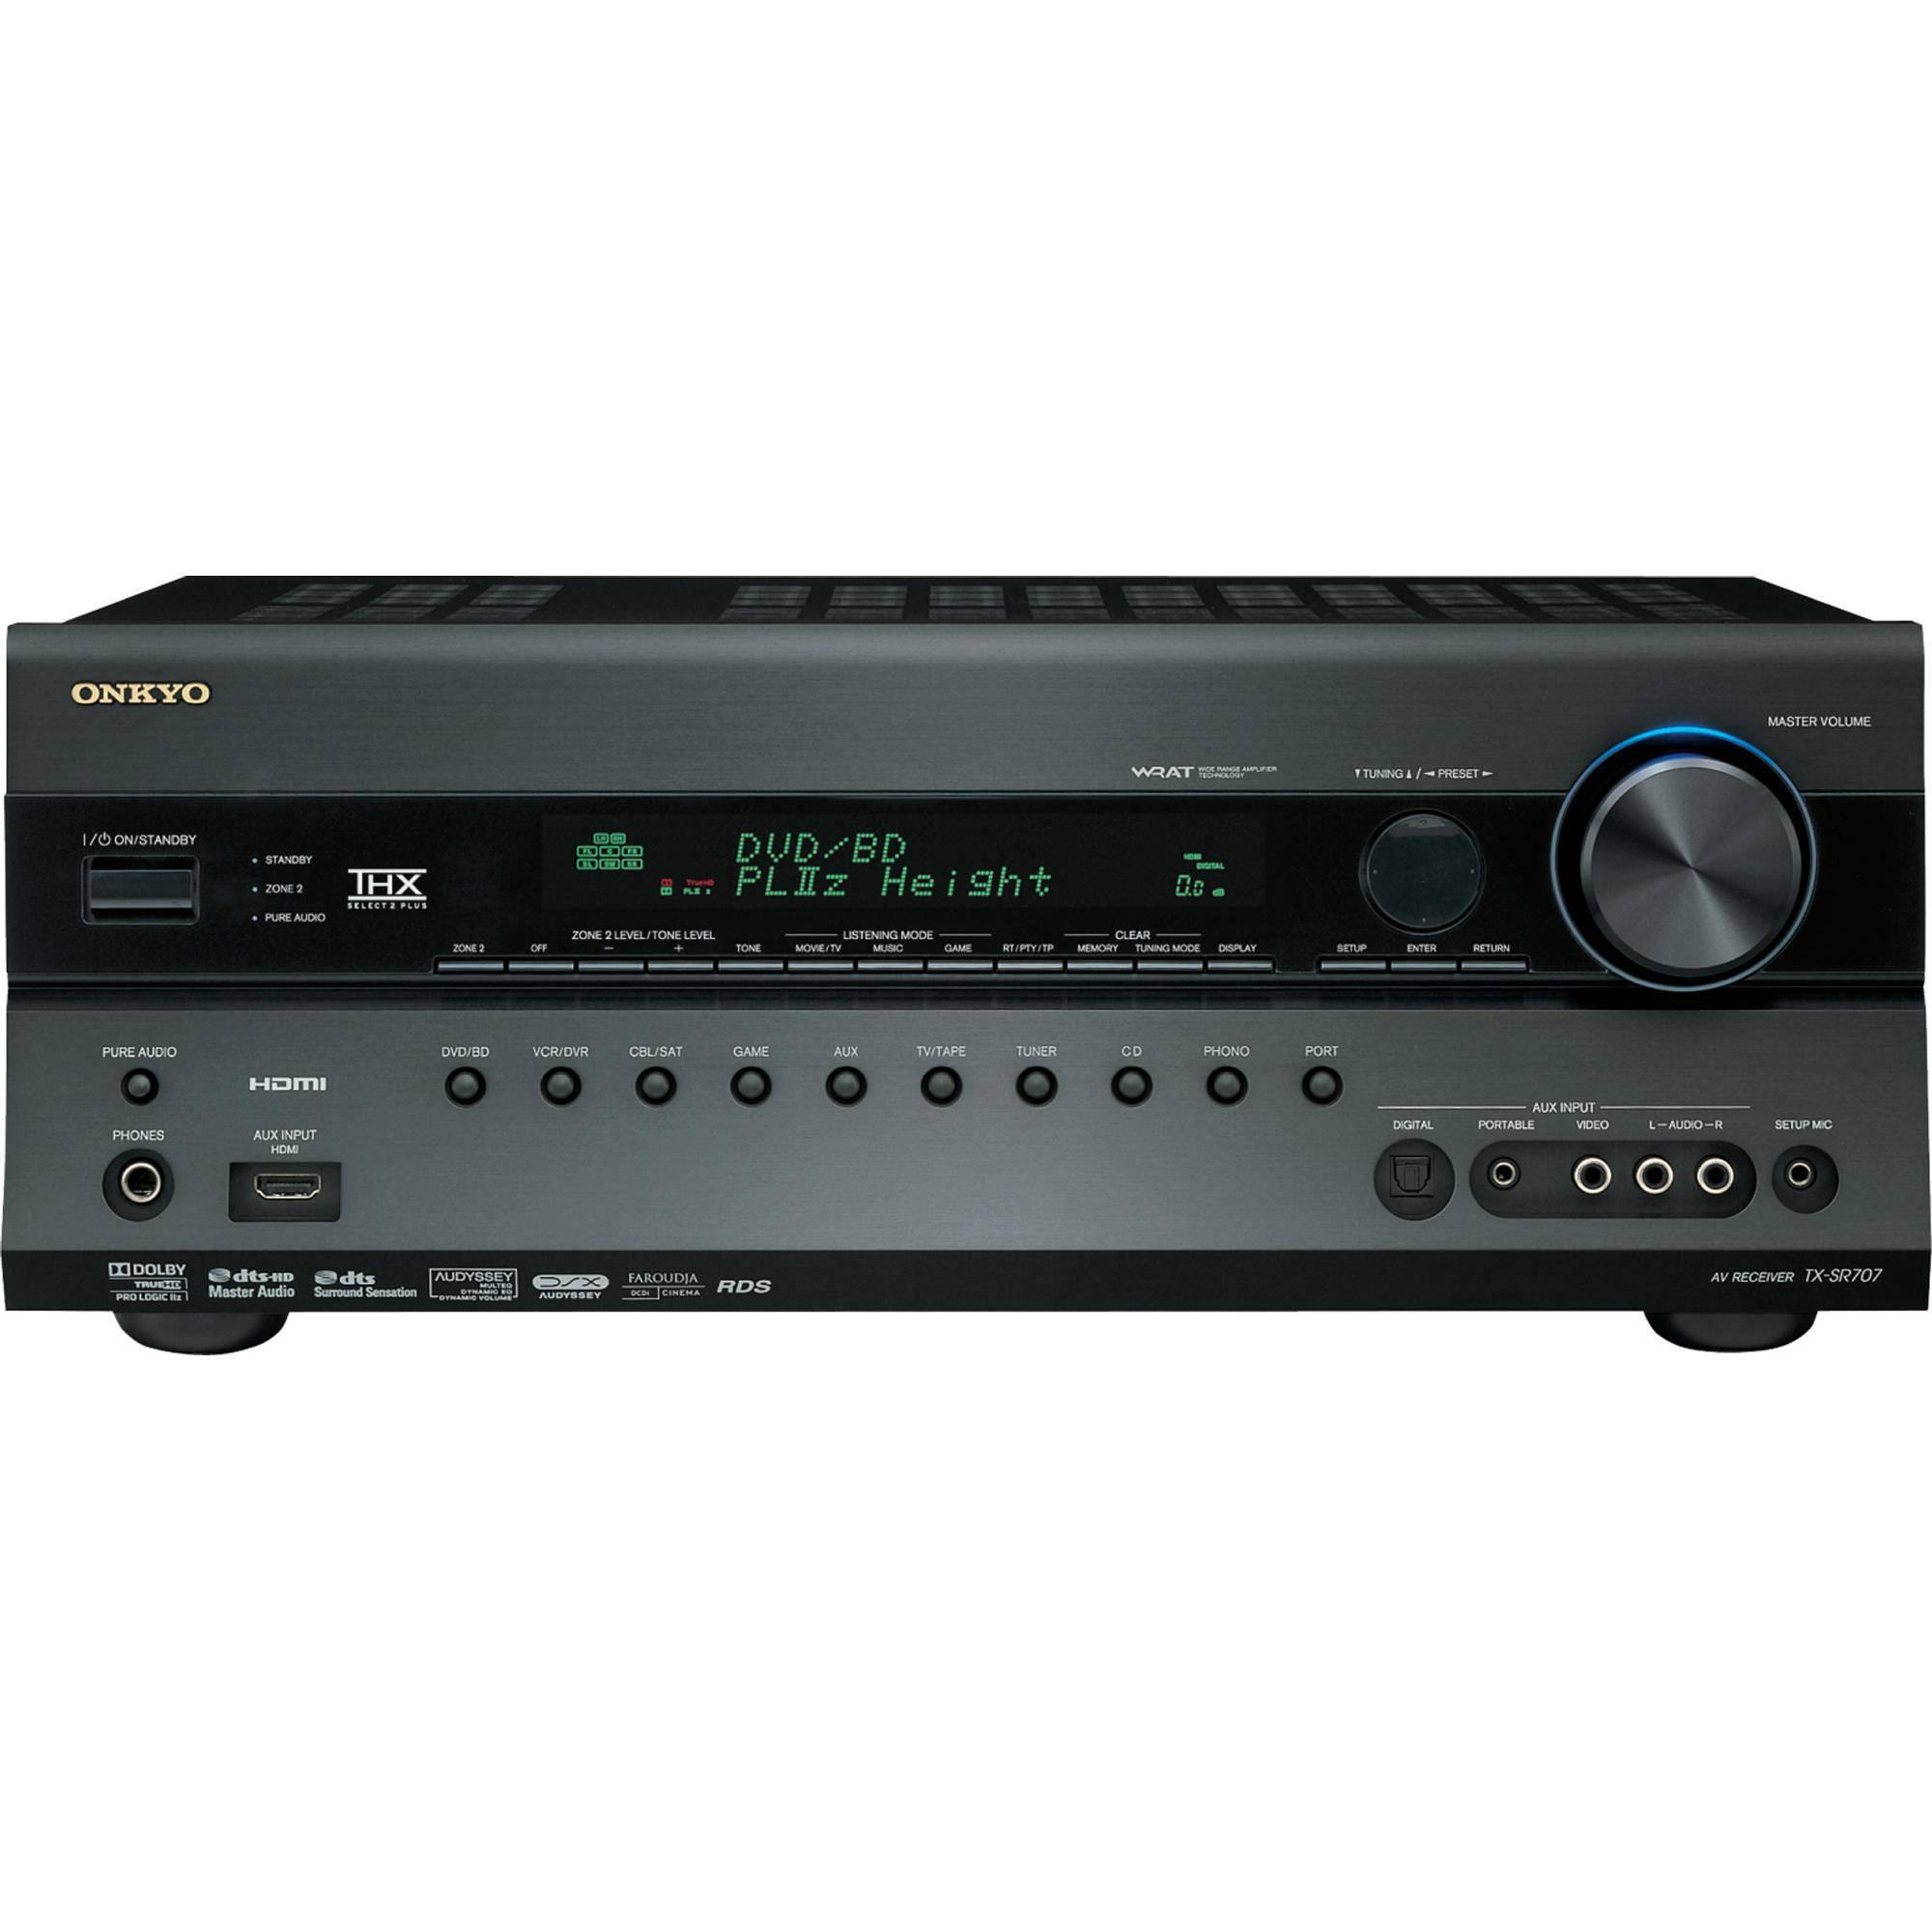 Onkyo TX-SR707 7 2-Channel Home Theater Receiver (Black)